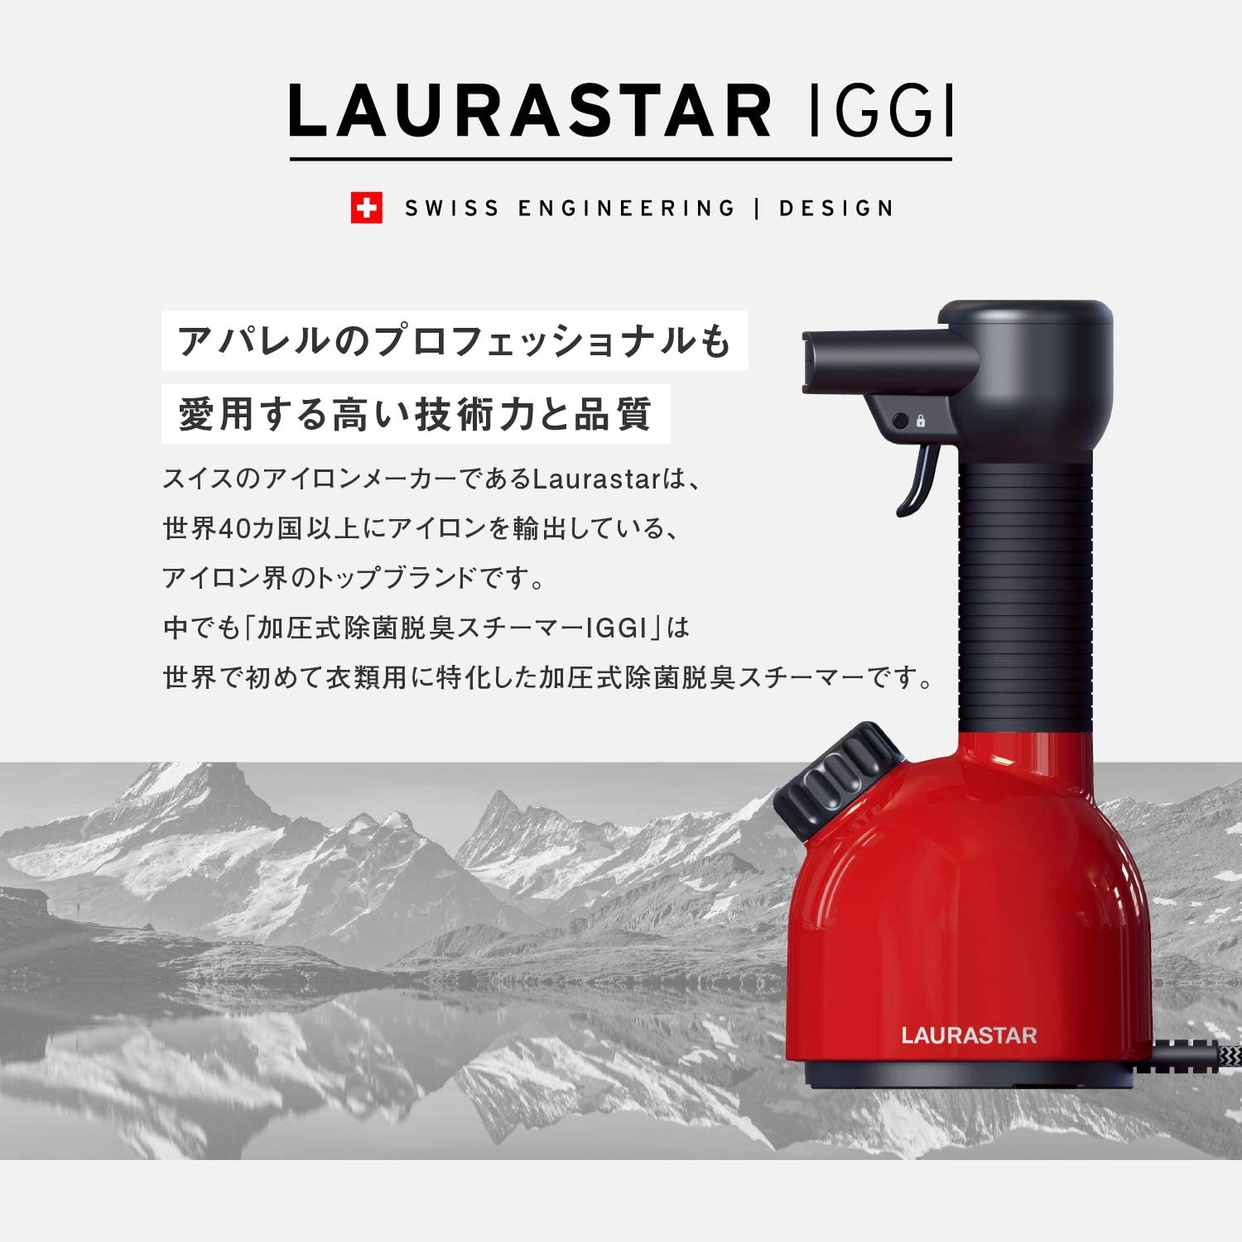 LAURASTAR(ローラスター) IGGI IGGIREDJPの商品画像6